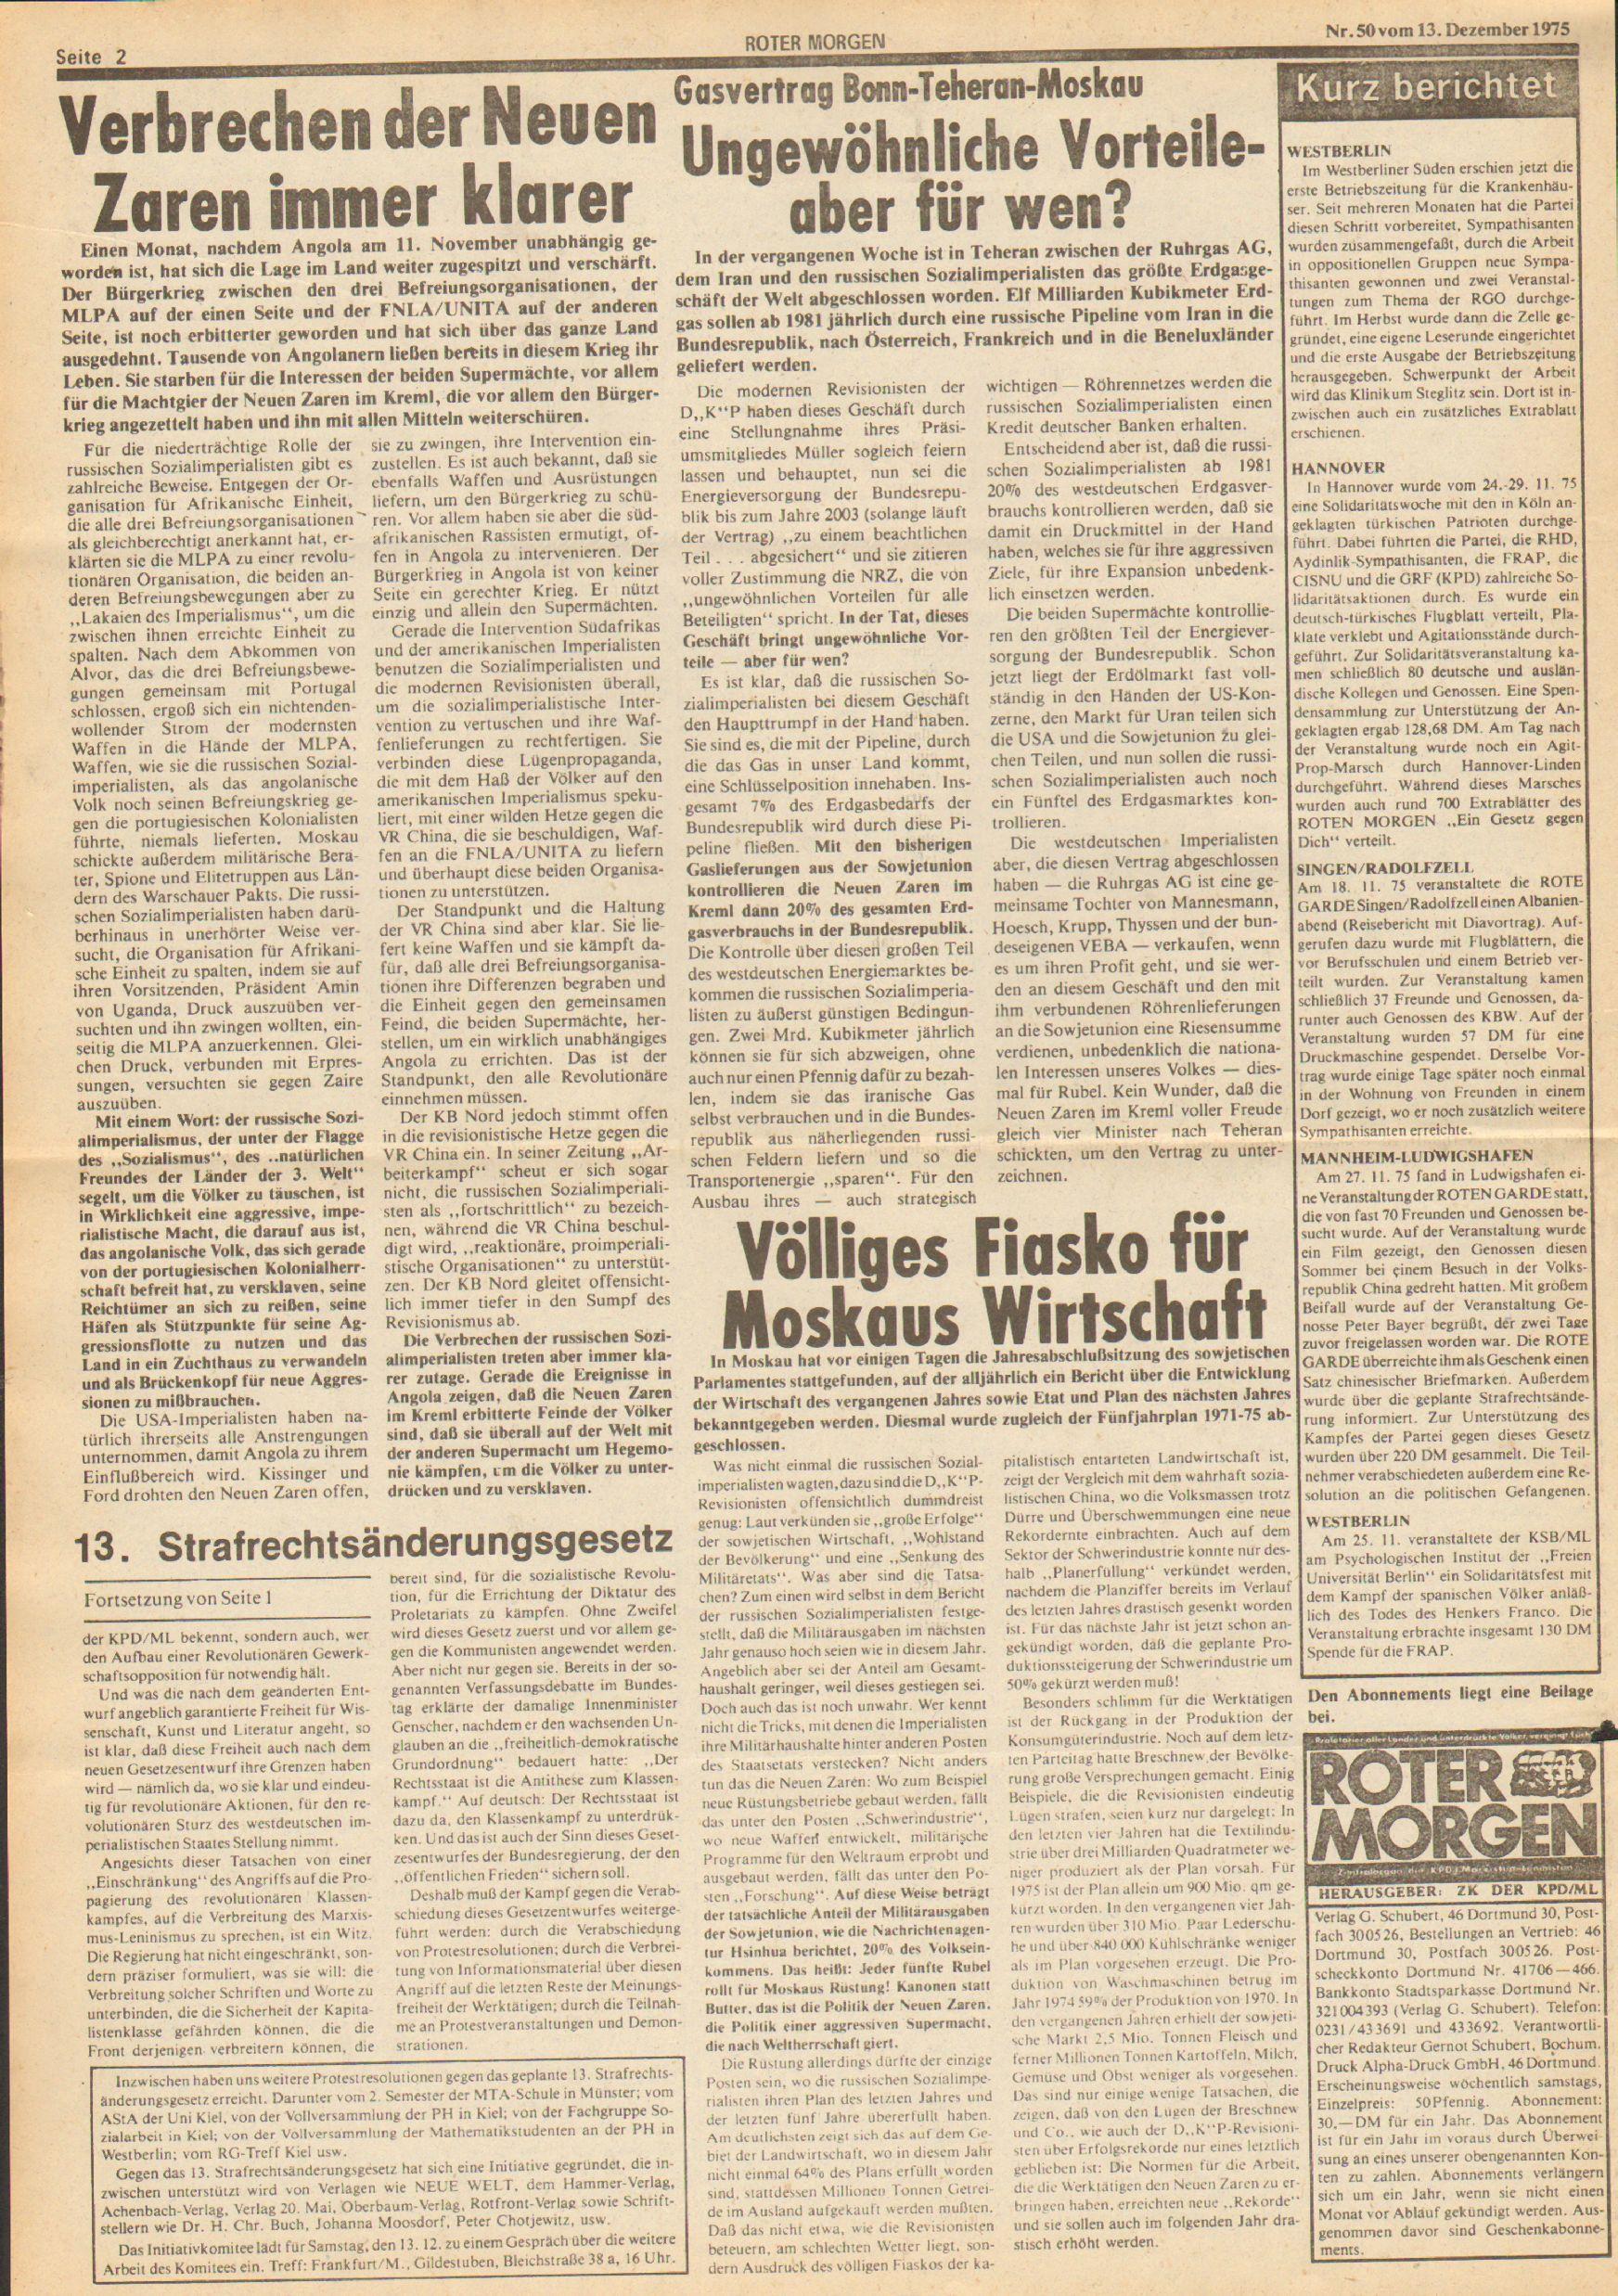 Roter Morgen, 9. Jg., 13. Dezember 1975, Nr. 50, Seite 2